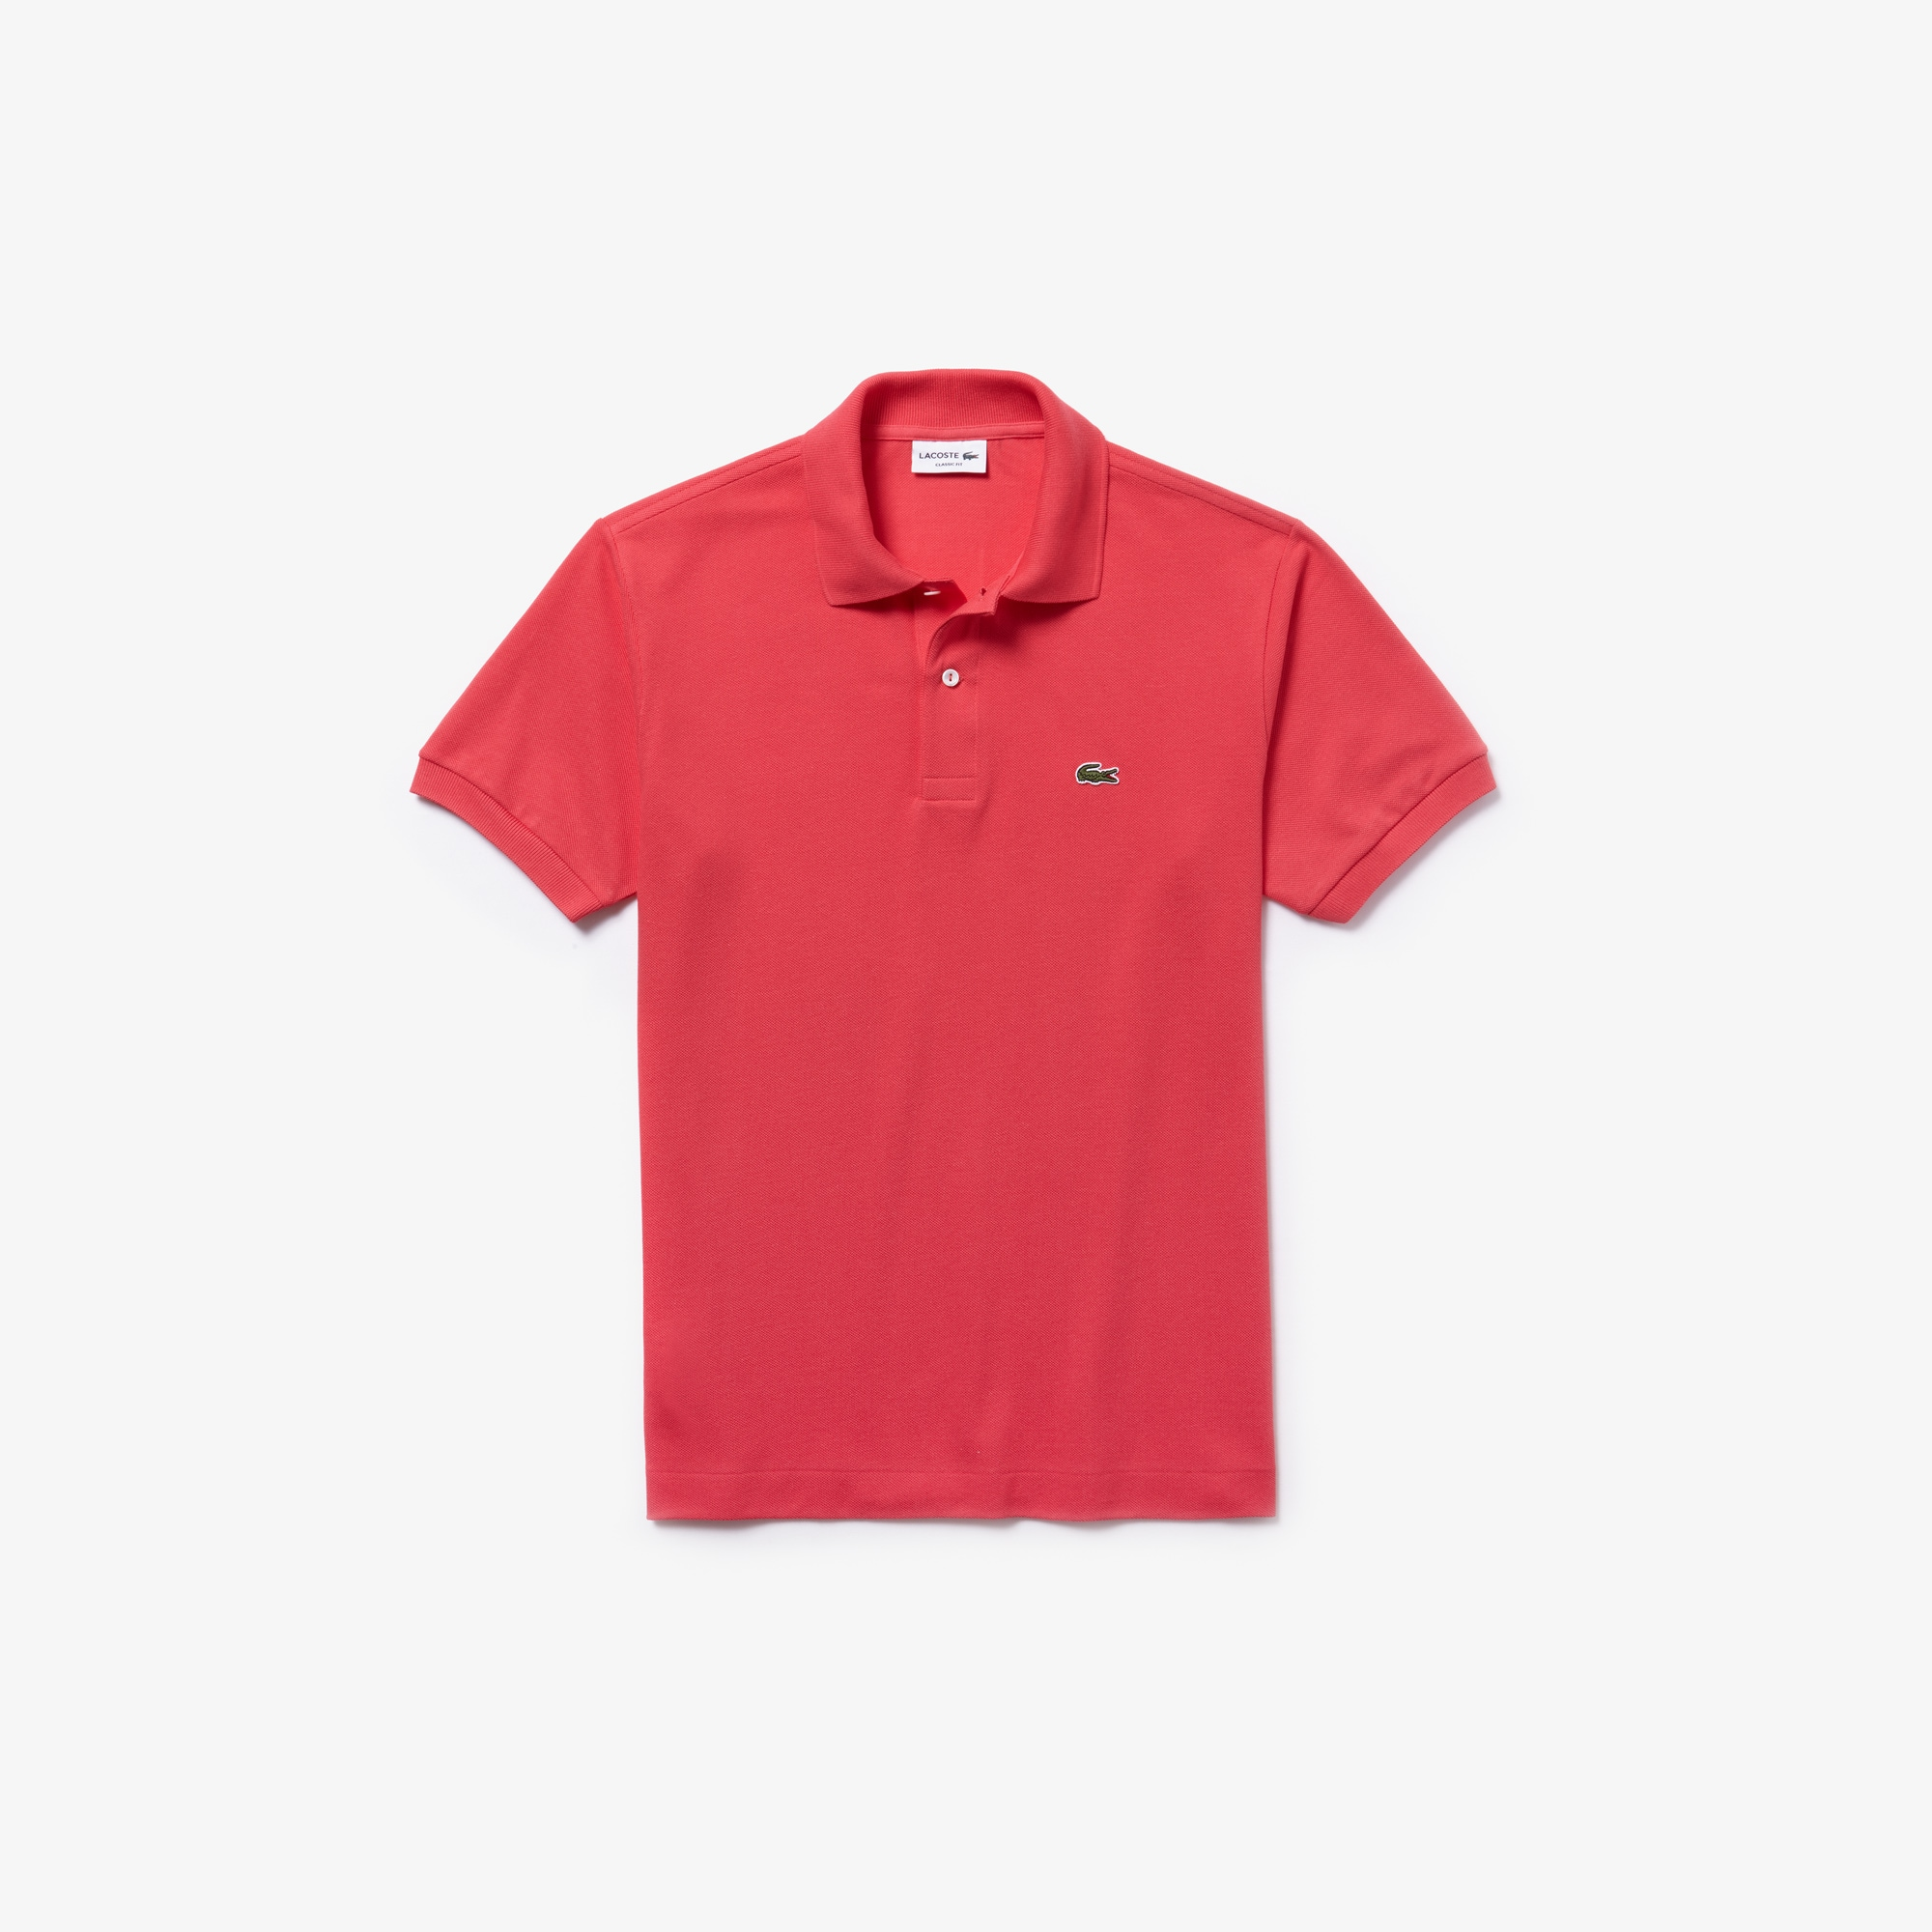 93f8b9e71cbe3 Camisas polo para homens, manga longa e manga curta   LACOSTE